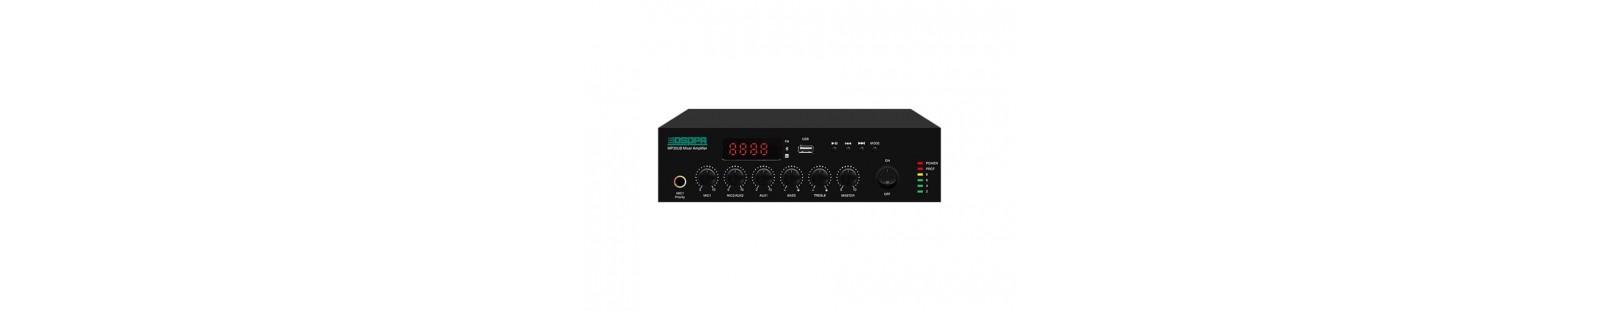 DSPPA MP35UB Ampli Class D công suất 35W